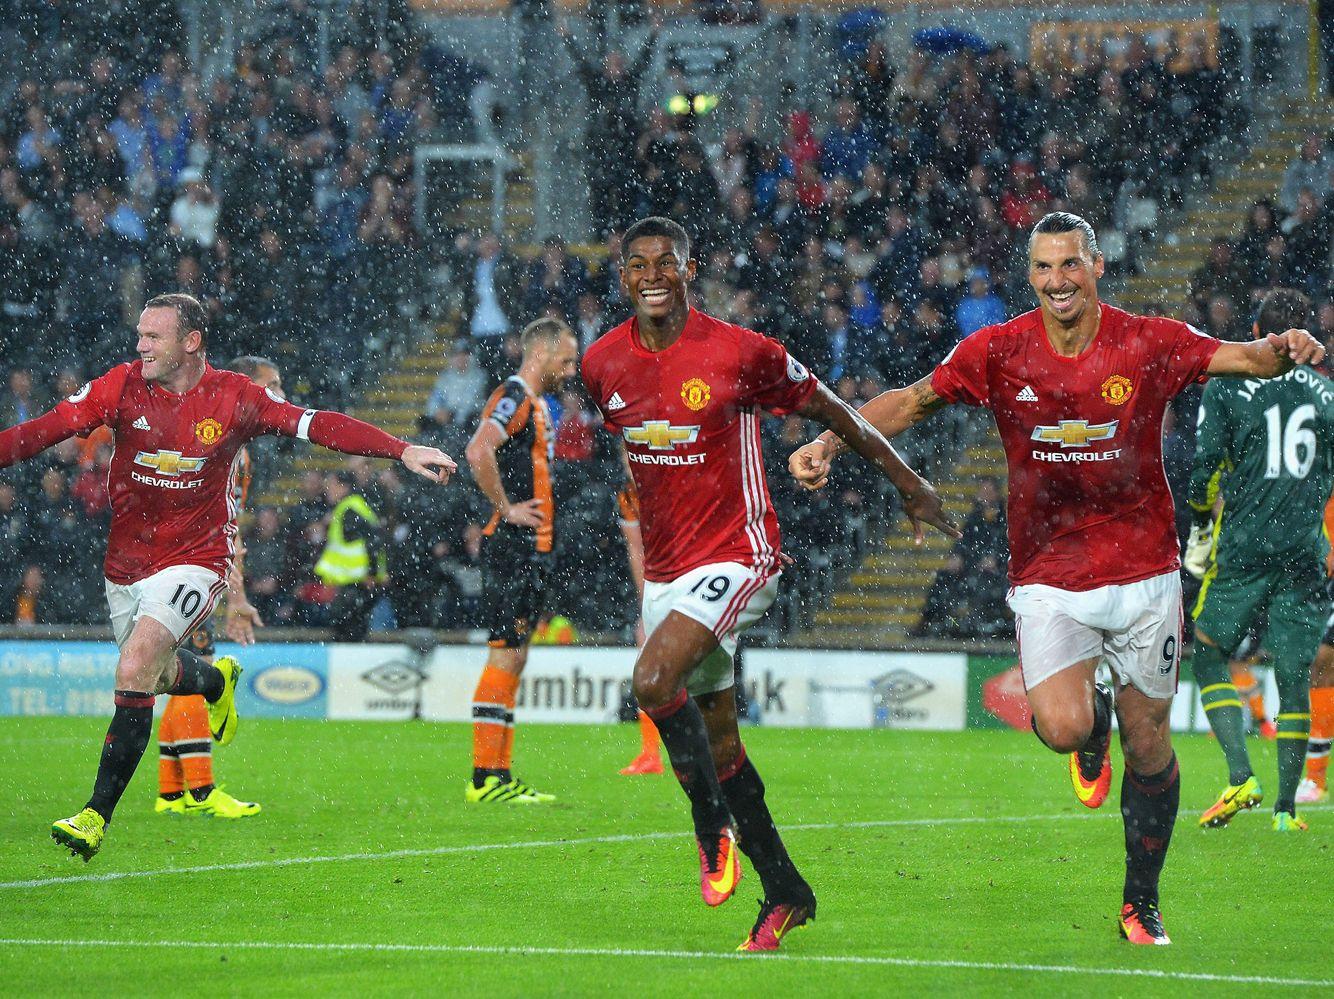 Rashford Celebrate Scoring Against Hull In Fergie Time Season 2016 17 M3 Manchester United Manchester United Fans Manchester United Live